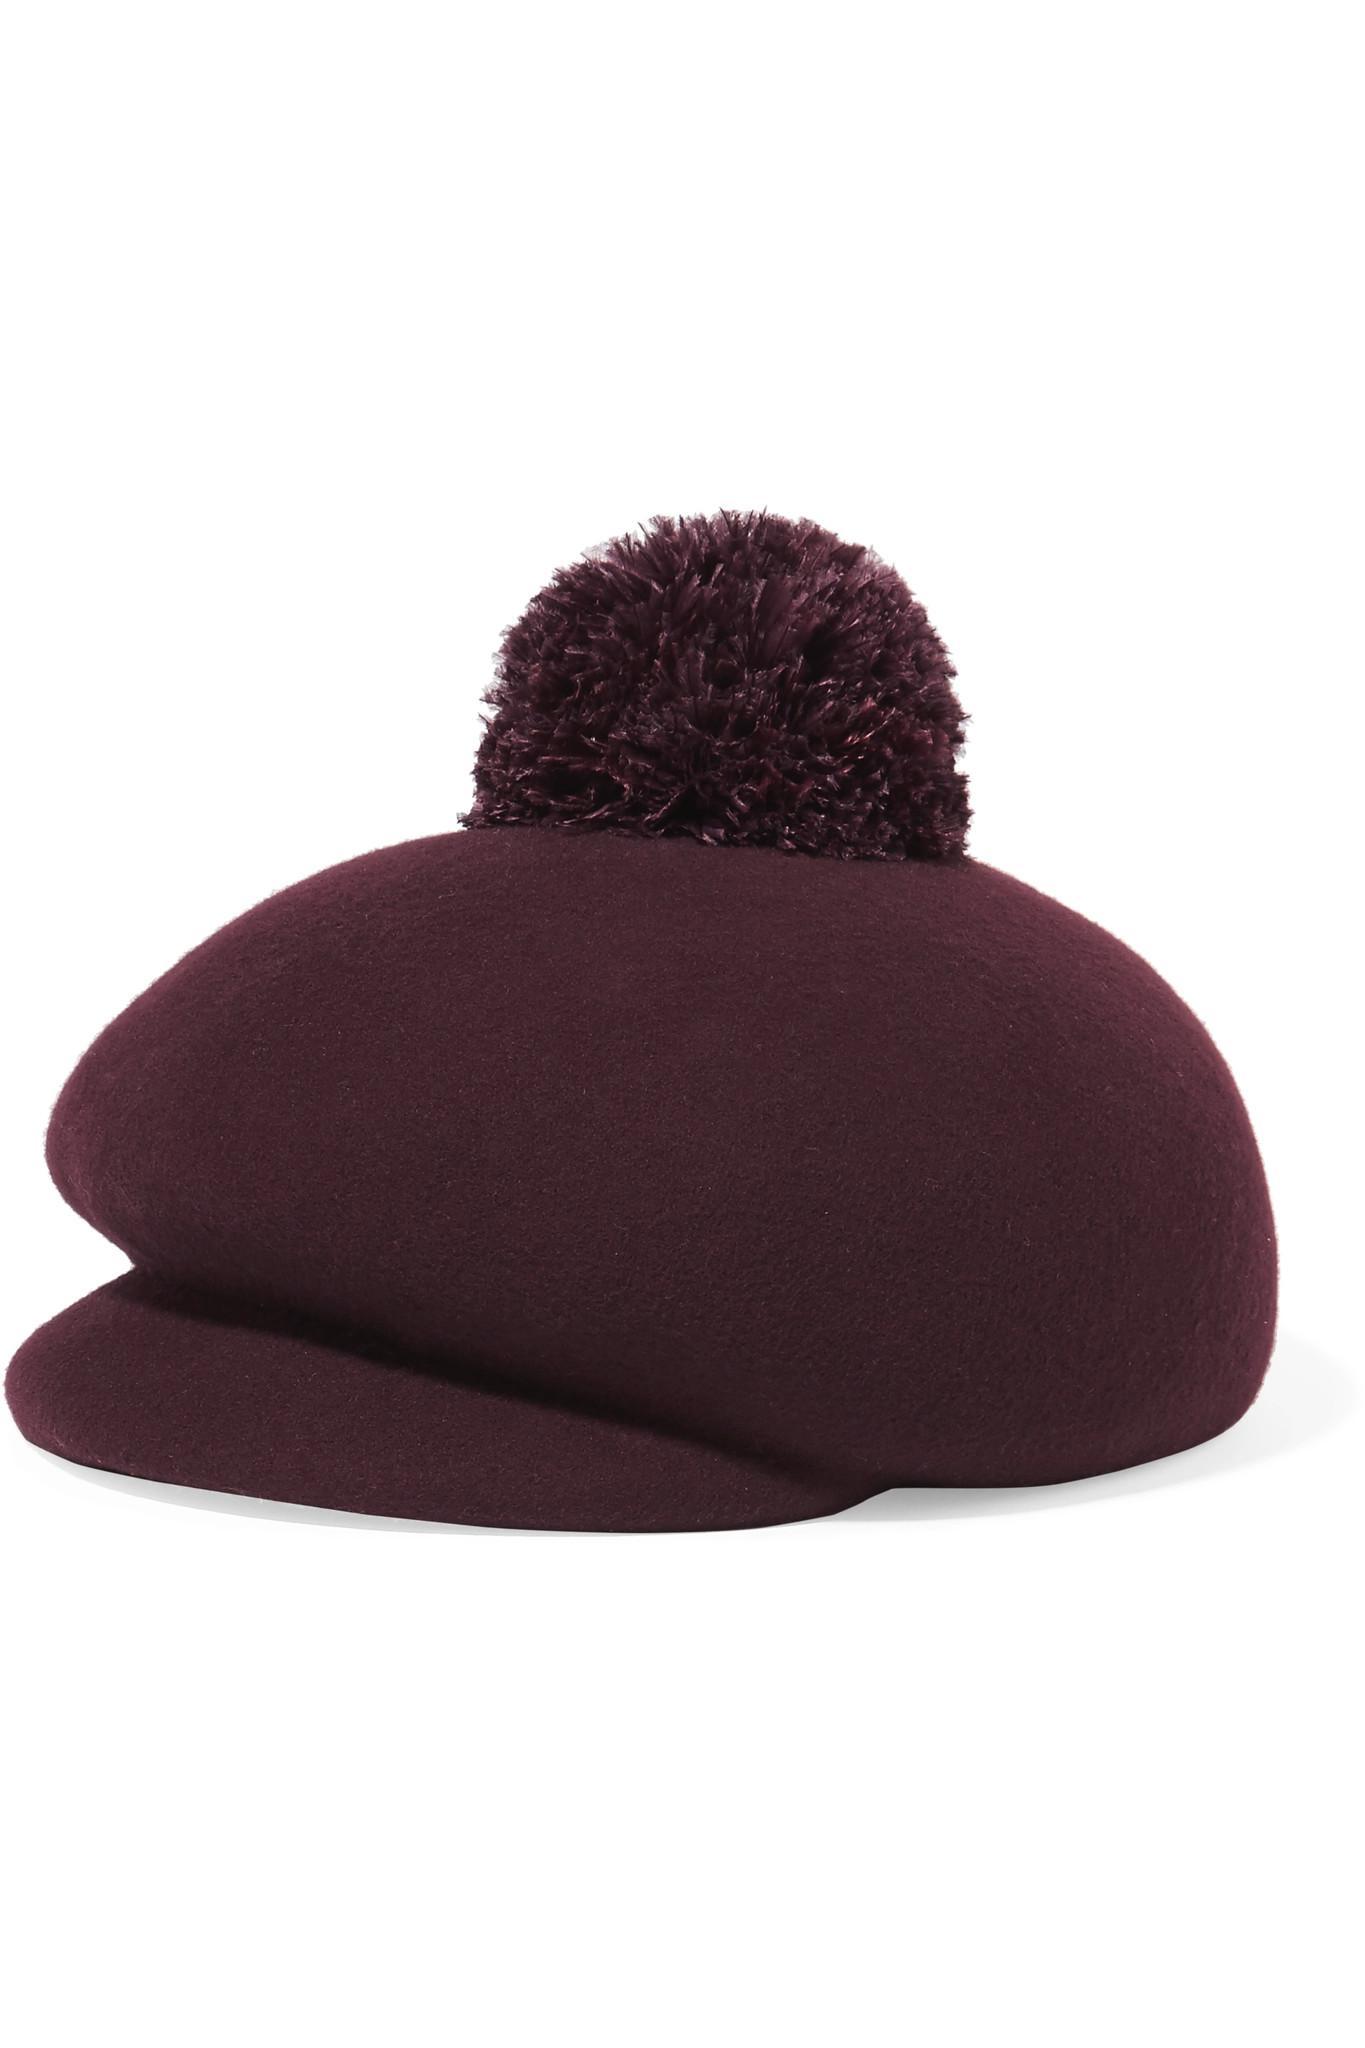 94e2880eefb Eugenia Kim Ogden Feather-embellished Wool-felt Cap - Lyst